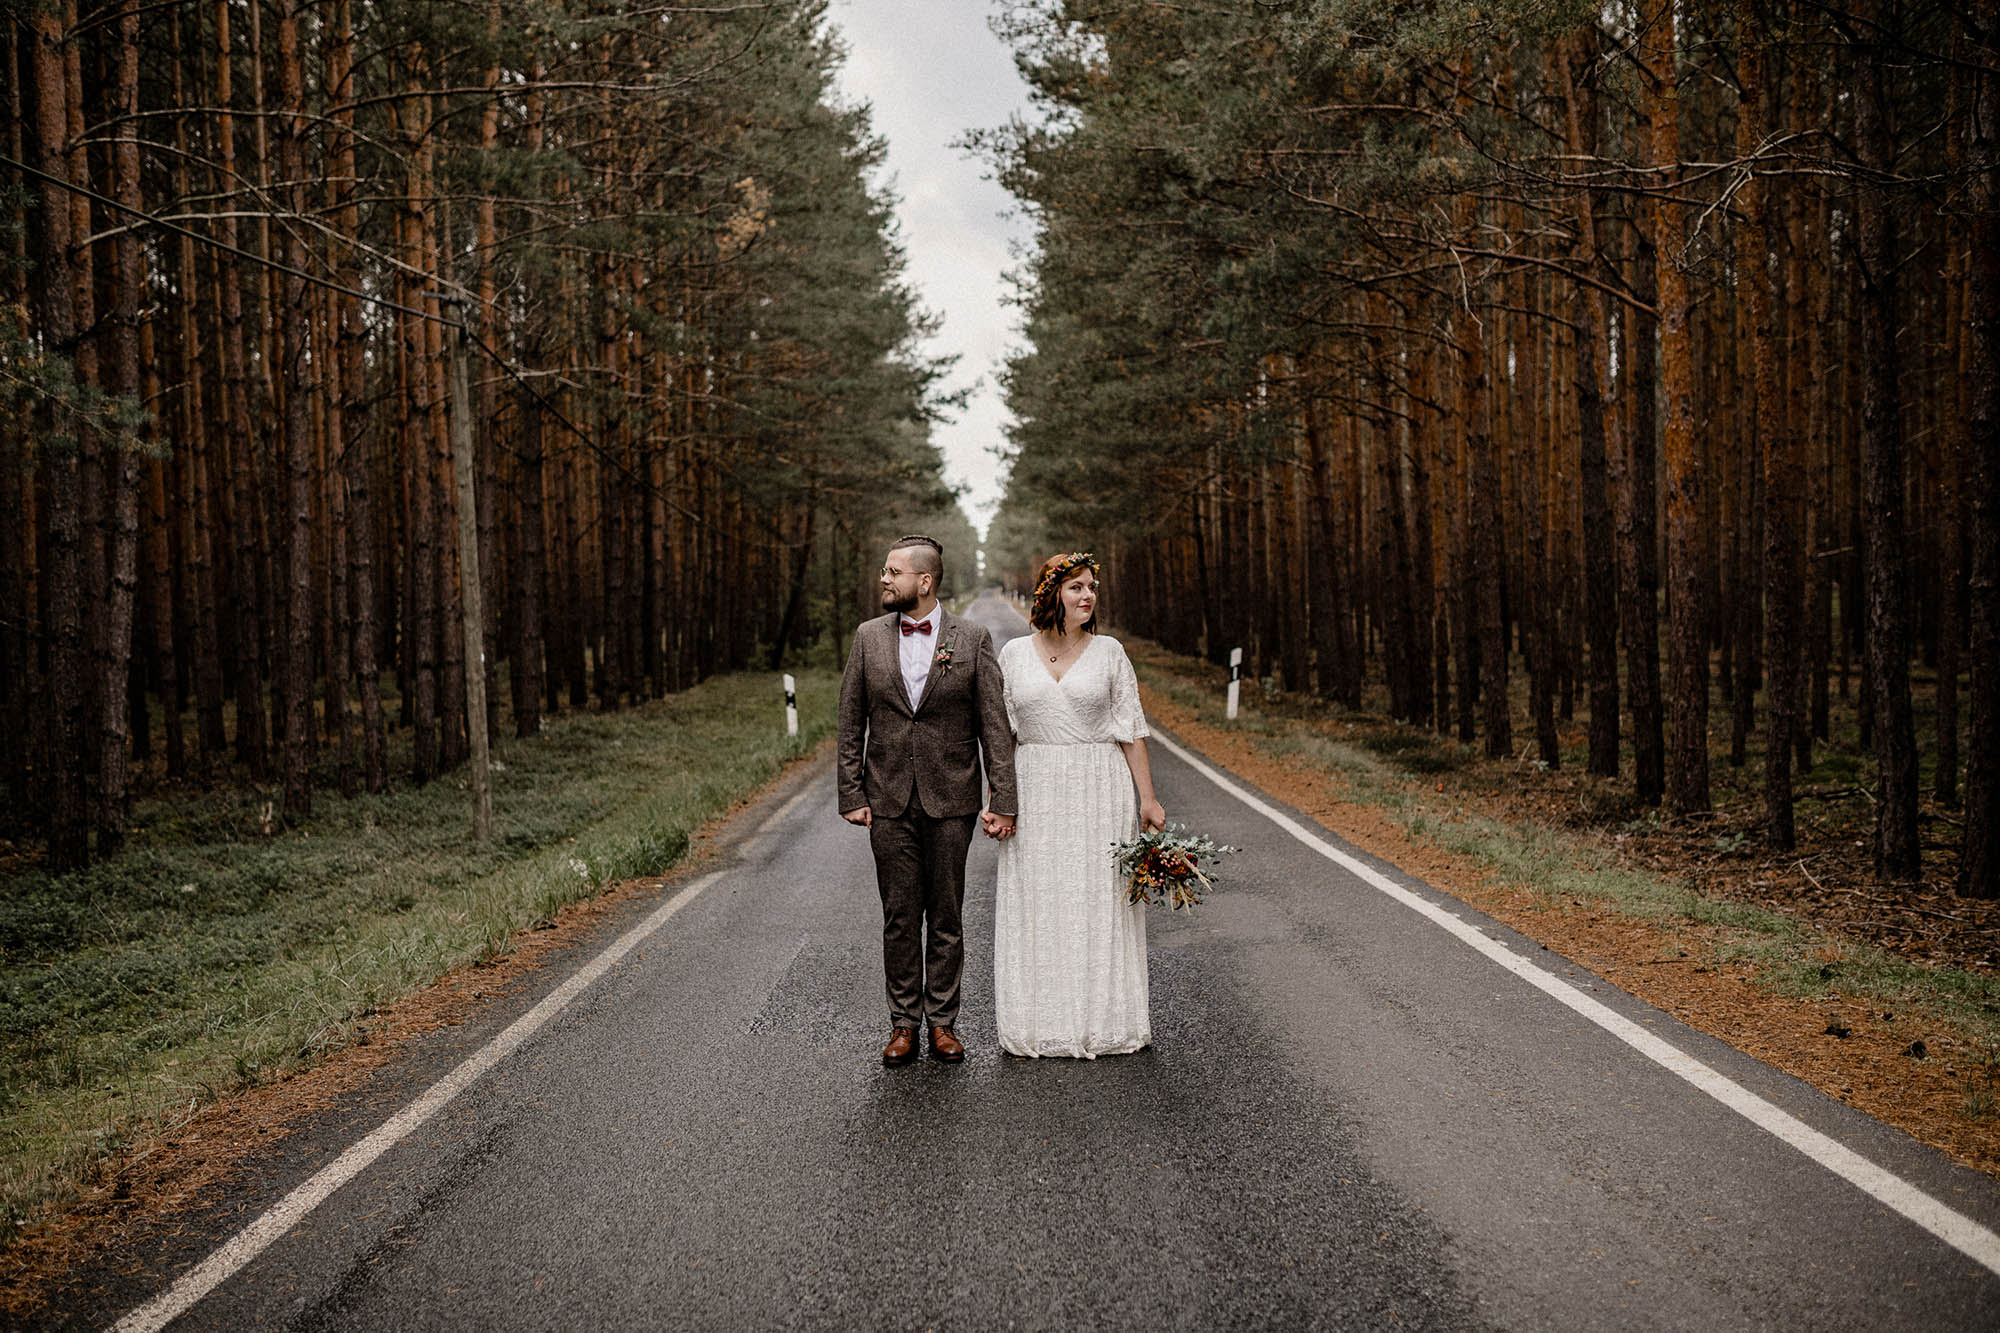 Virginia-Pech-Fotografie-Hochzeitsfotografie-Hochzeitsfotograf-Brandenburg-Spreewald-Spreewood-PC-105